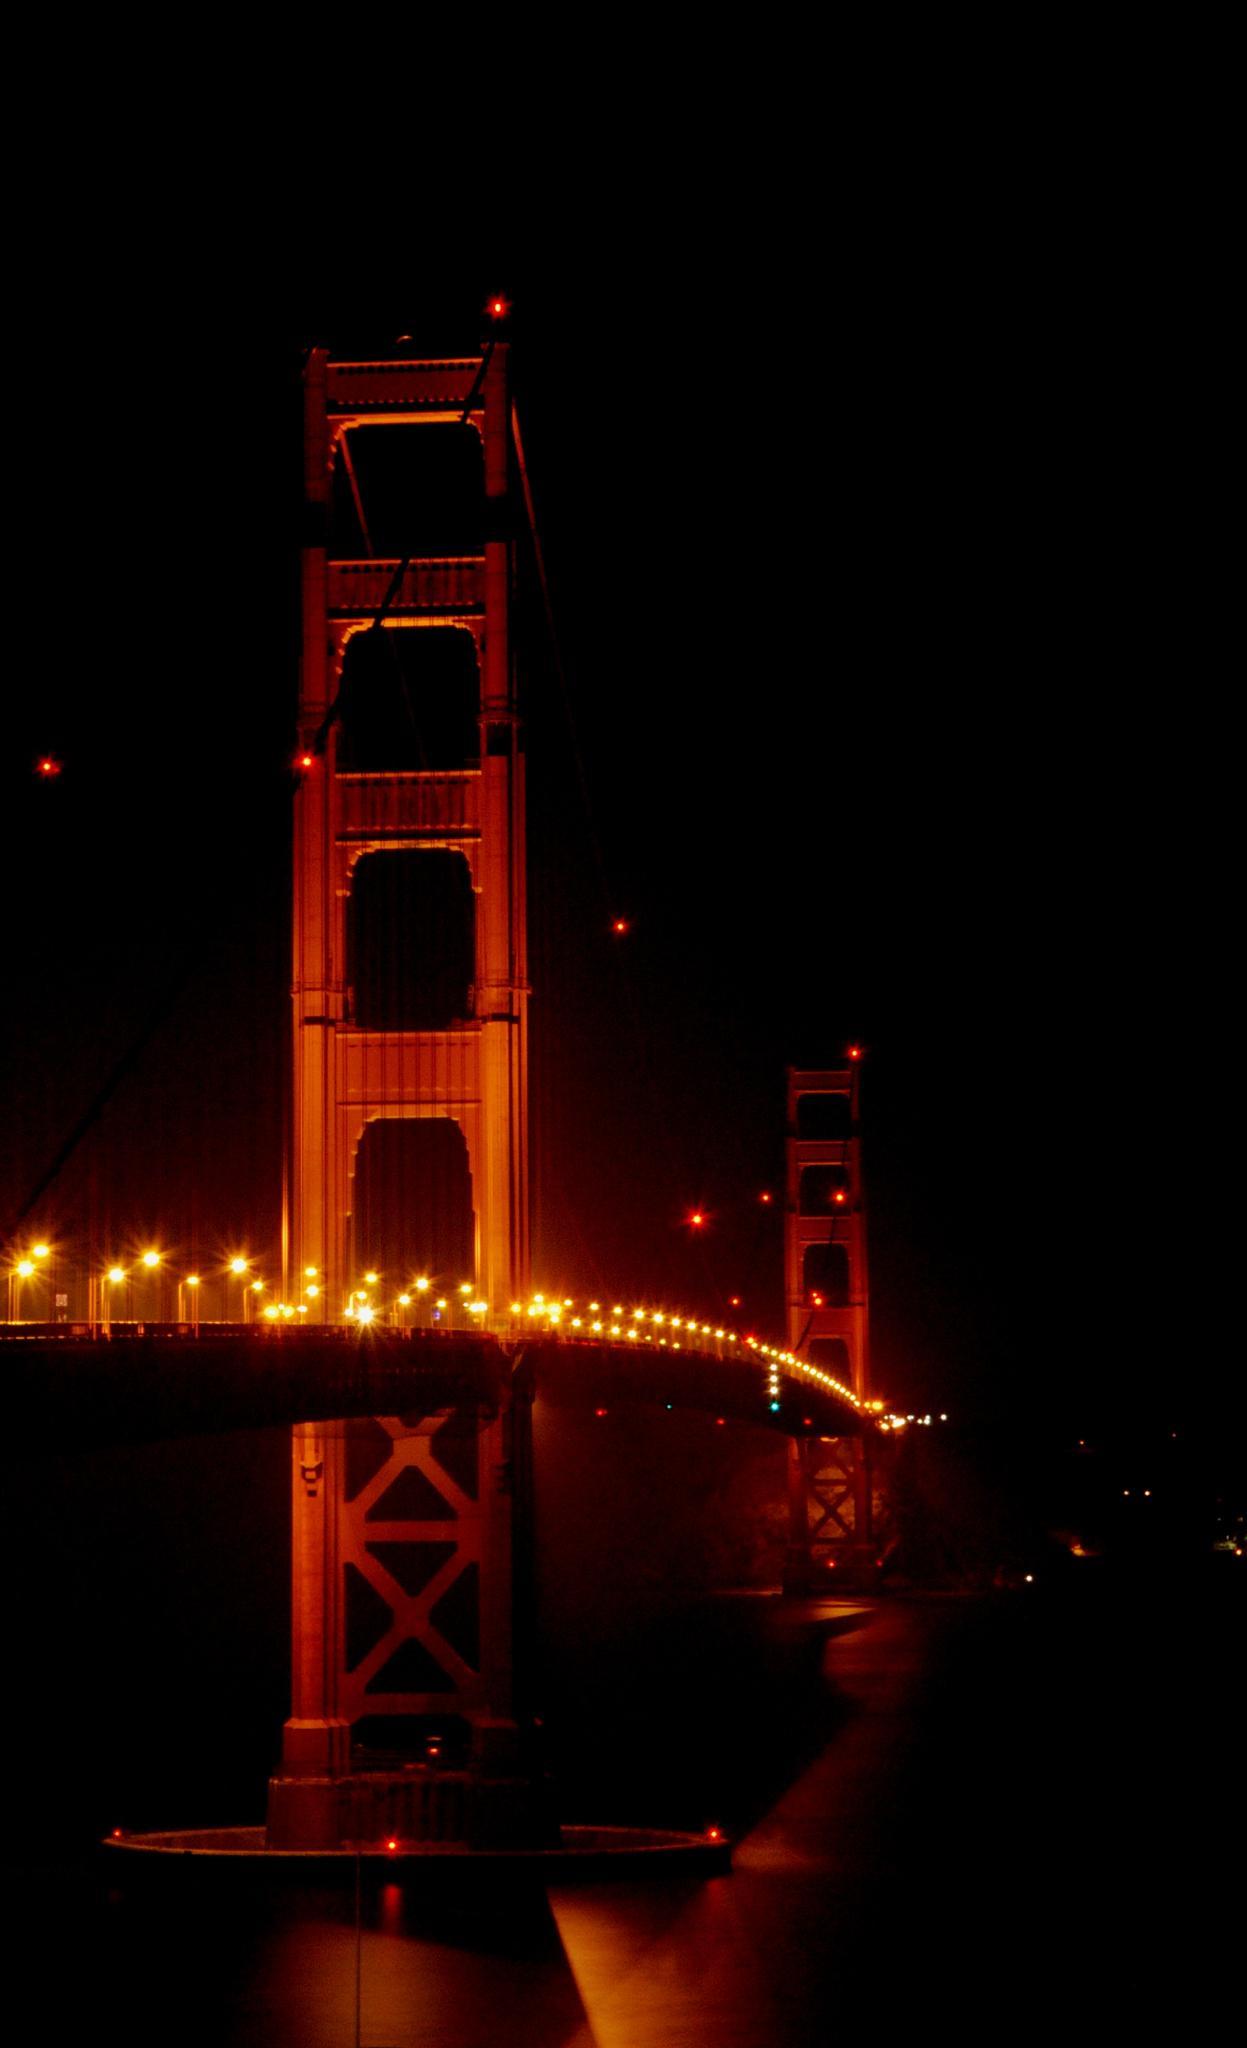 Golden Gate Bridge - View From El Presidio by Rogelio Flores